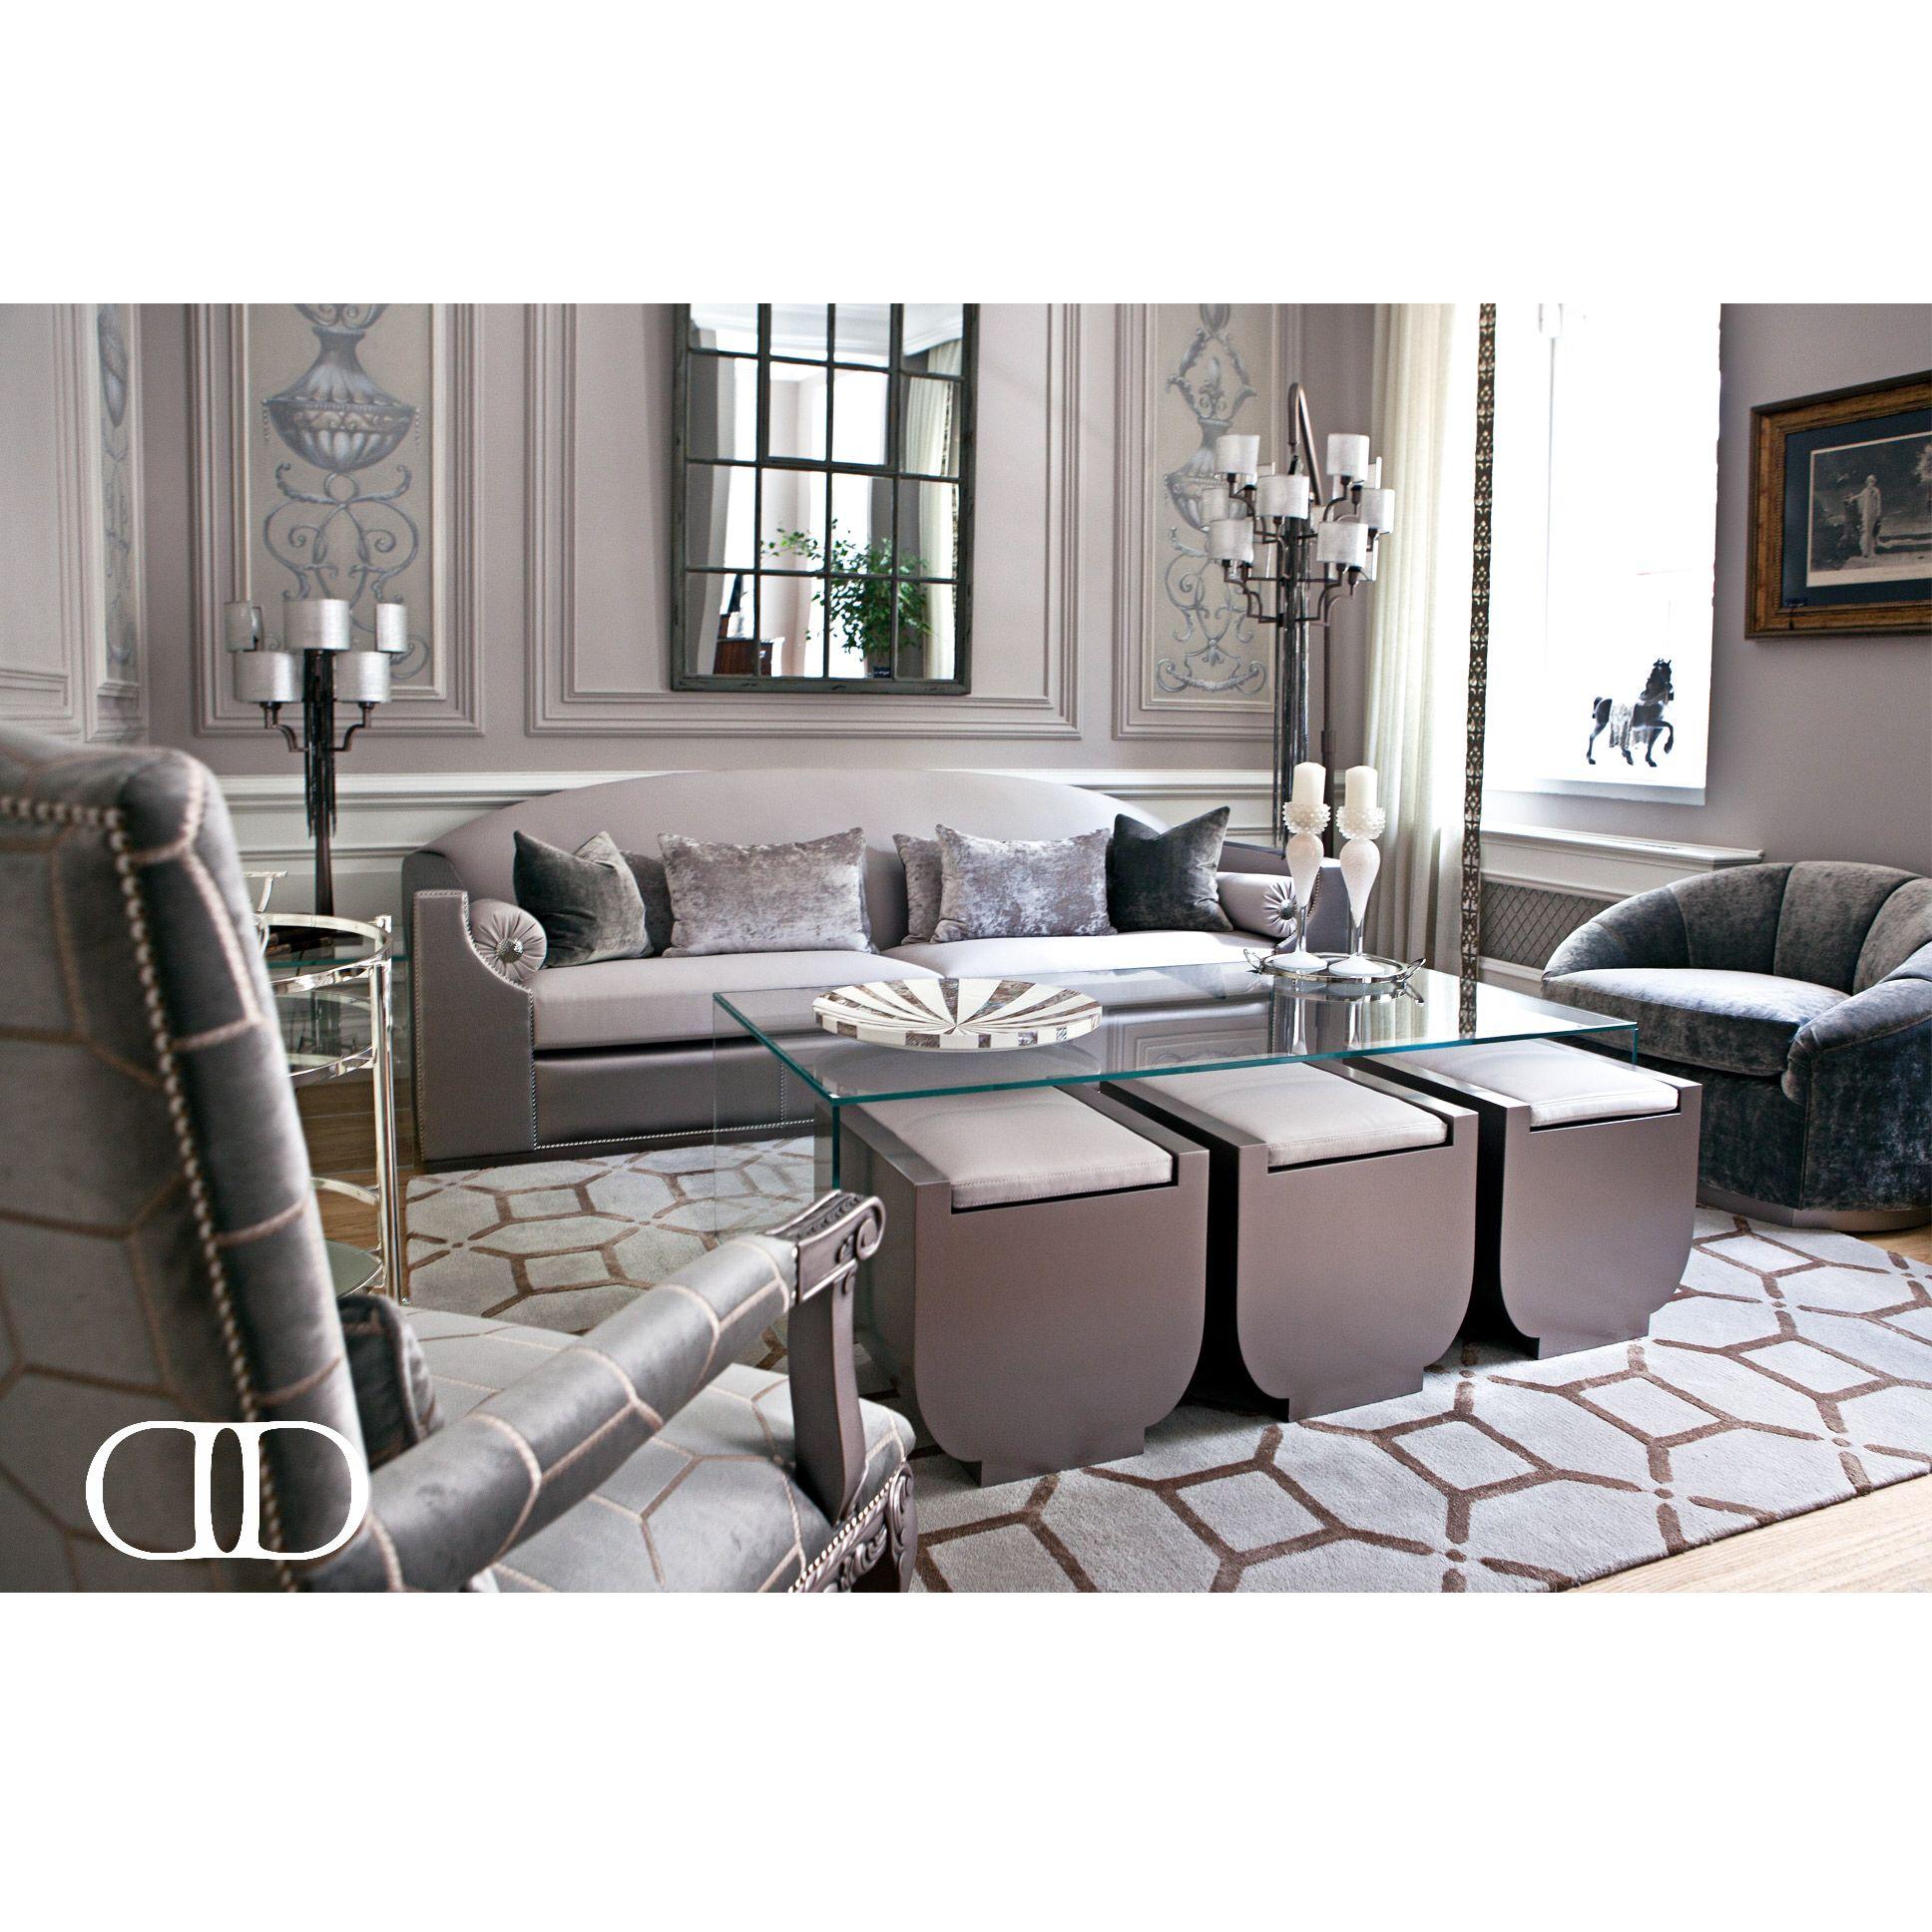 Jacqueline Sofa Large Throw Slipcover Charming Setting Dorya 39s Istanbul Round Chair